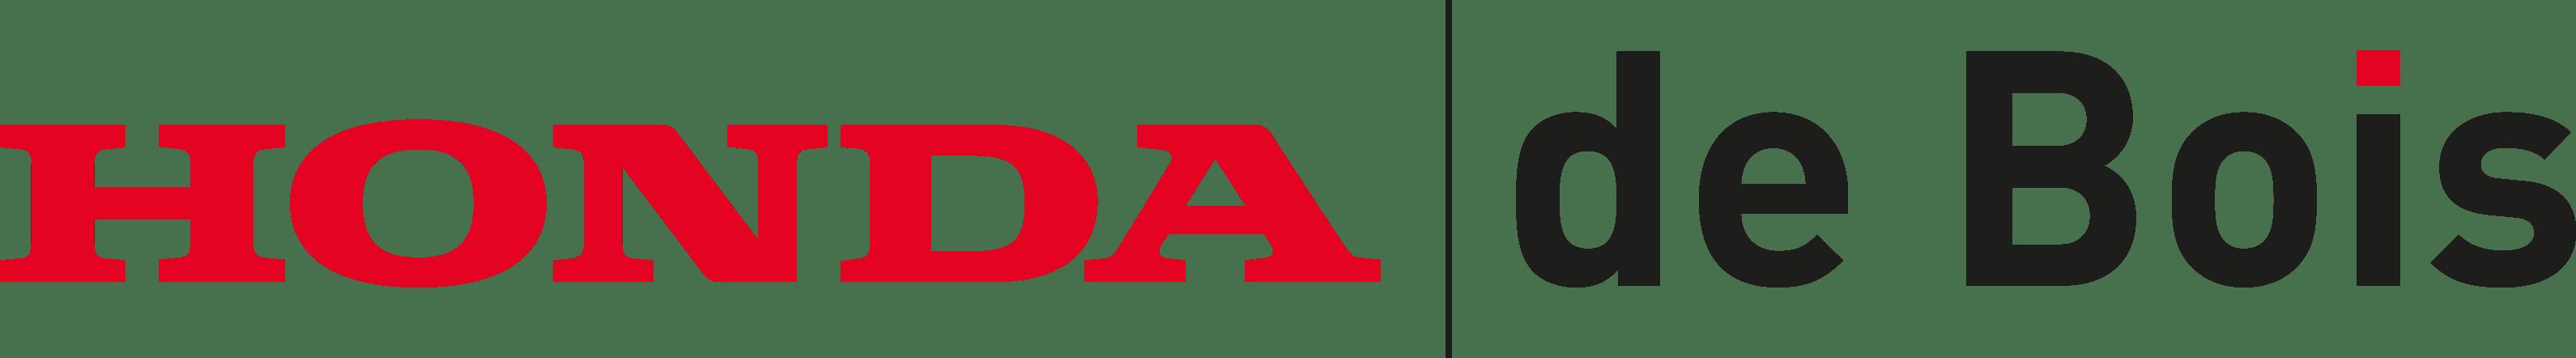 Honda de Bois - Royaal in Service